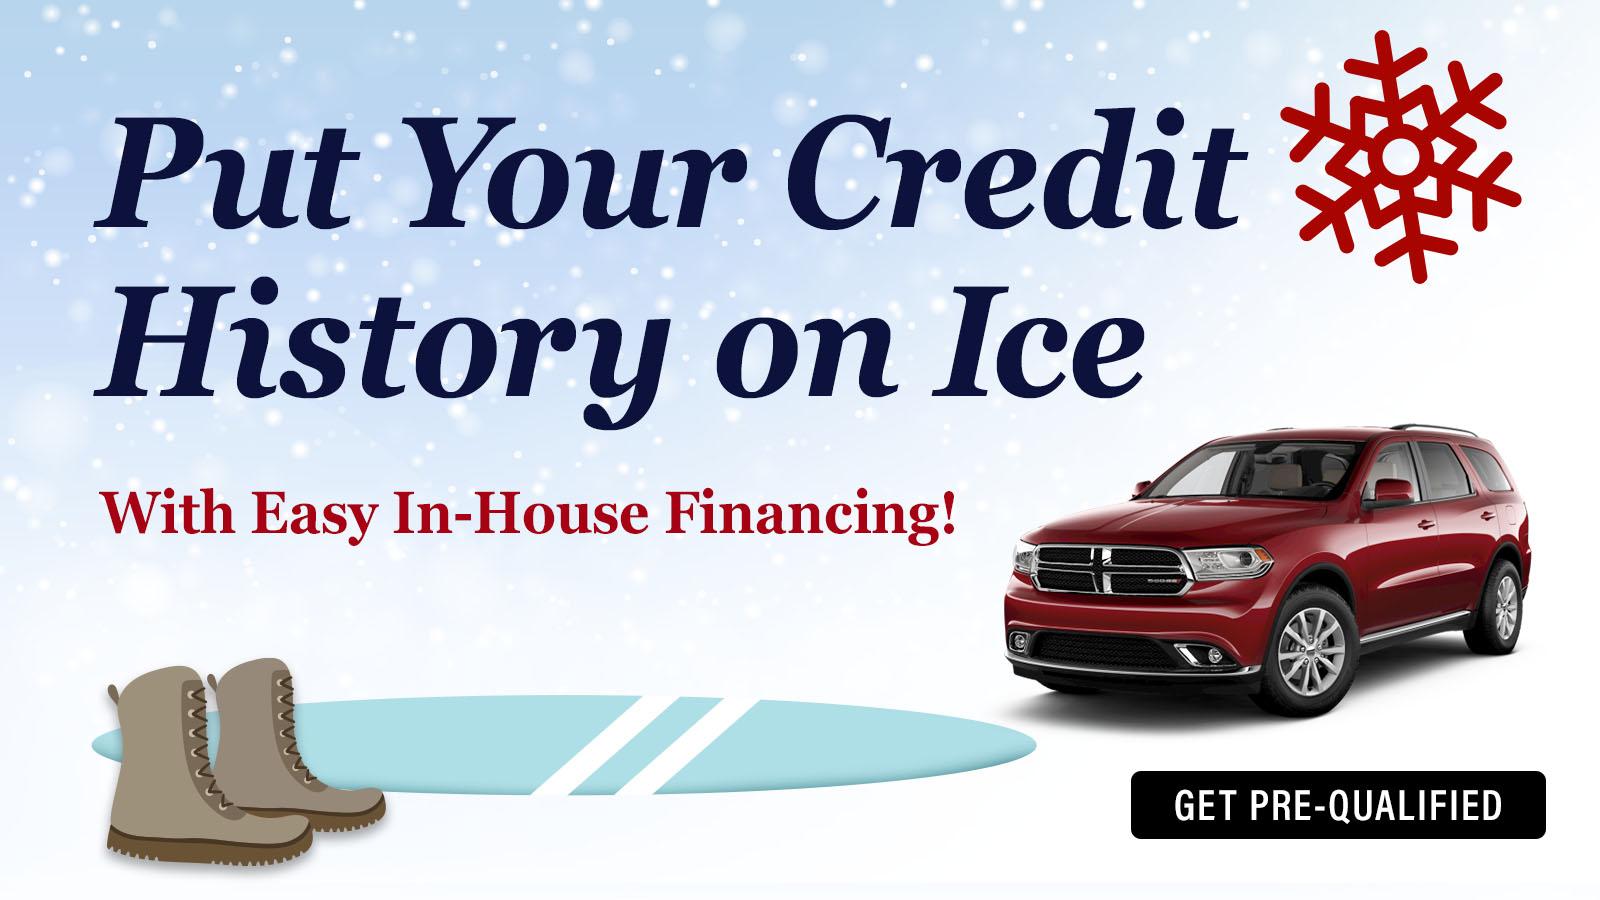 EZ in-house Financing